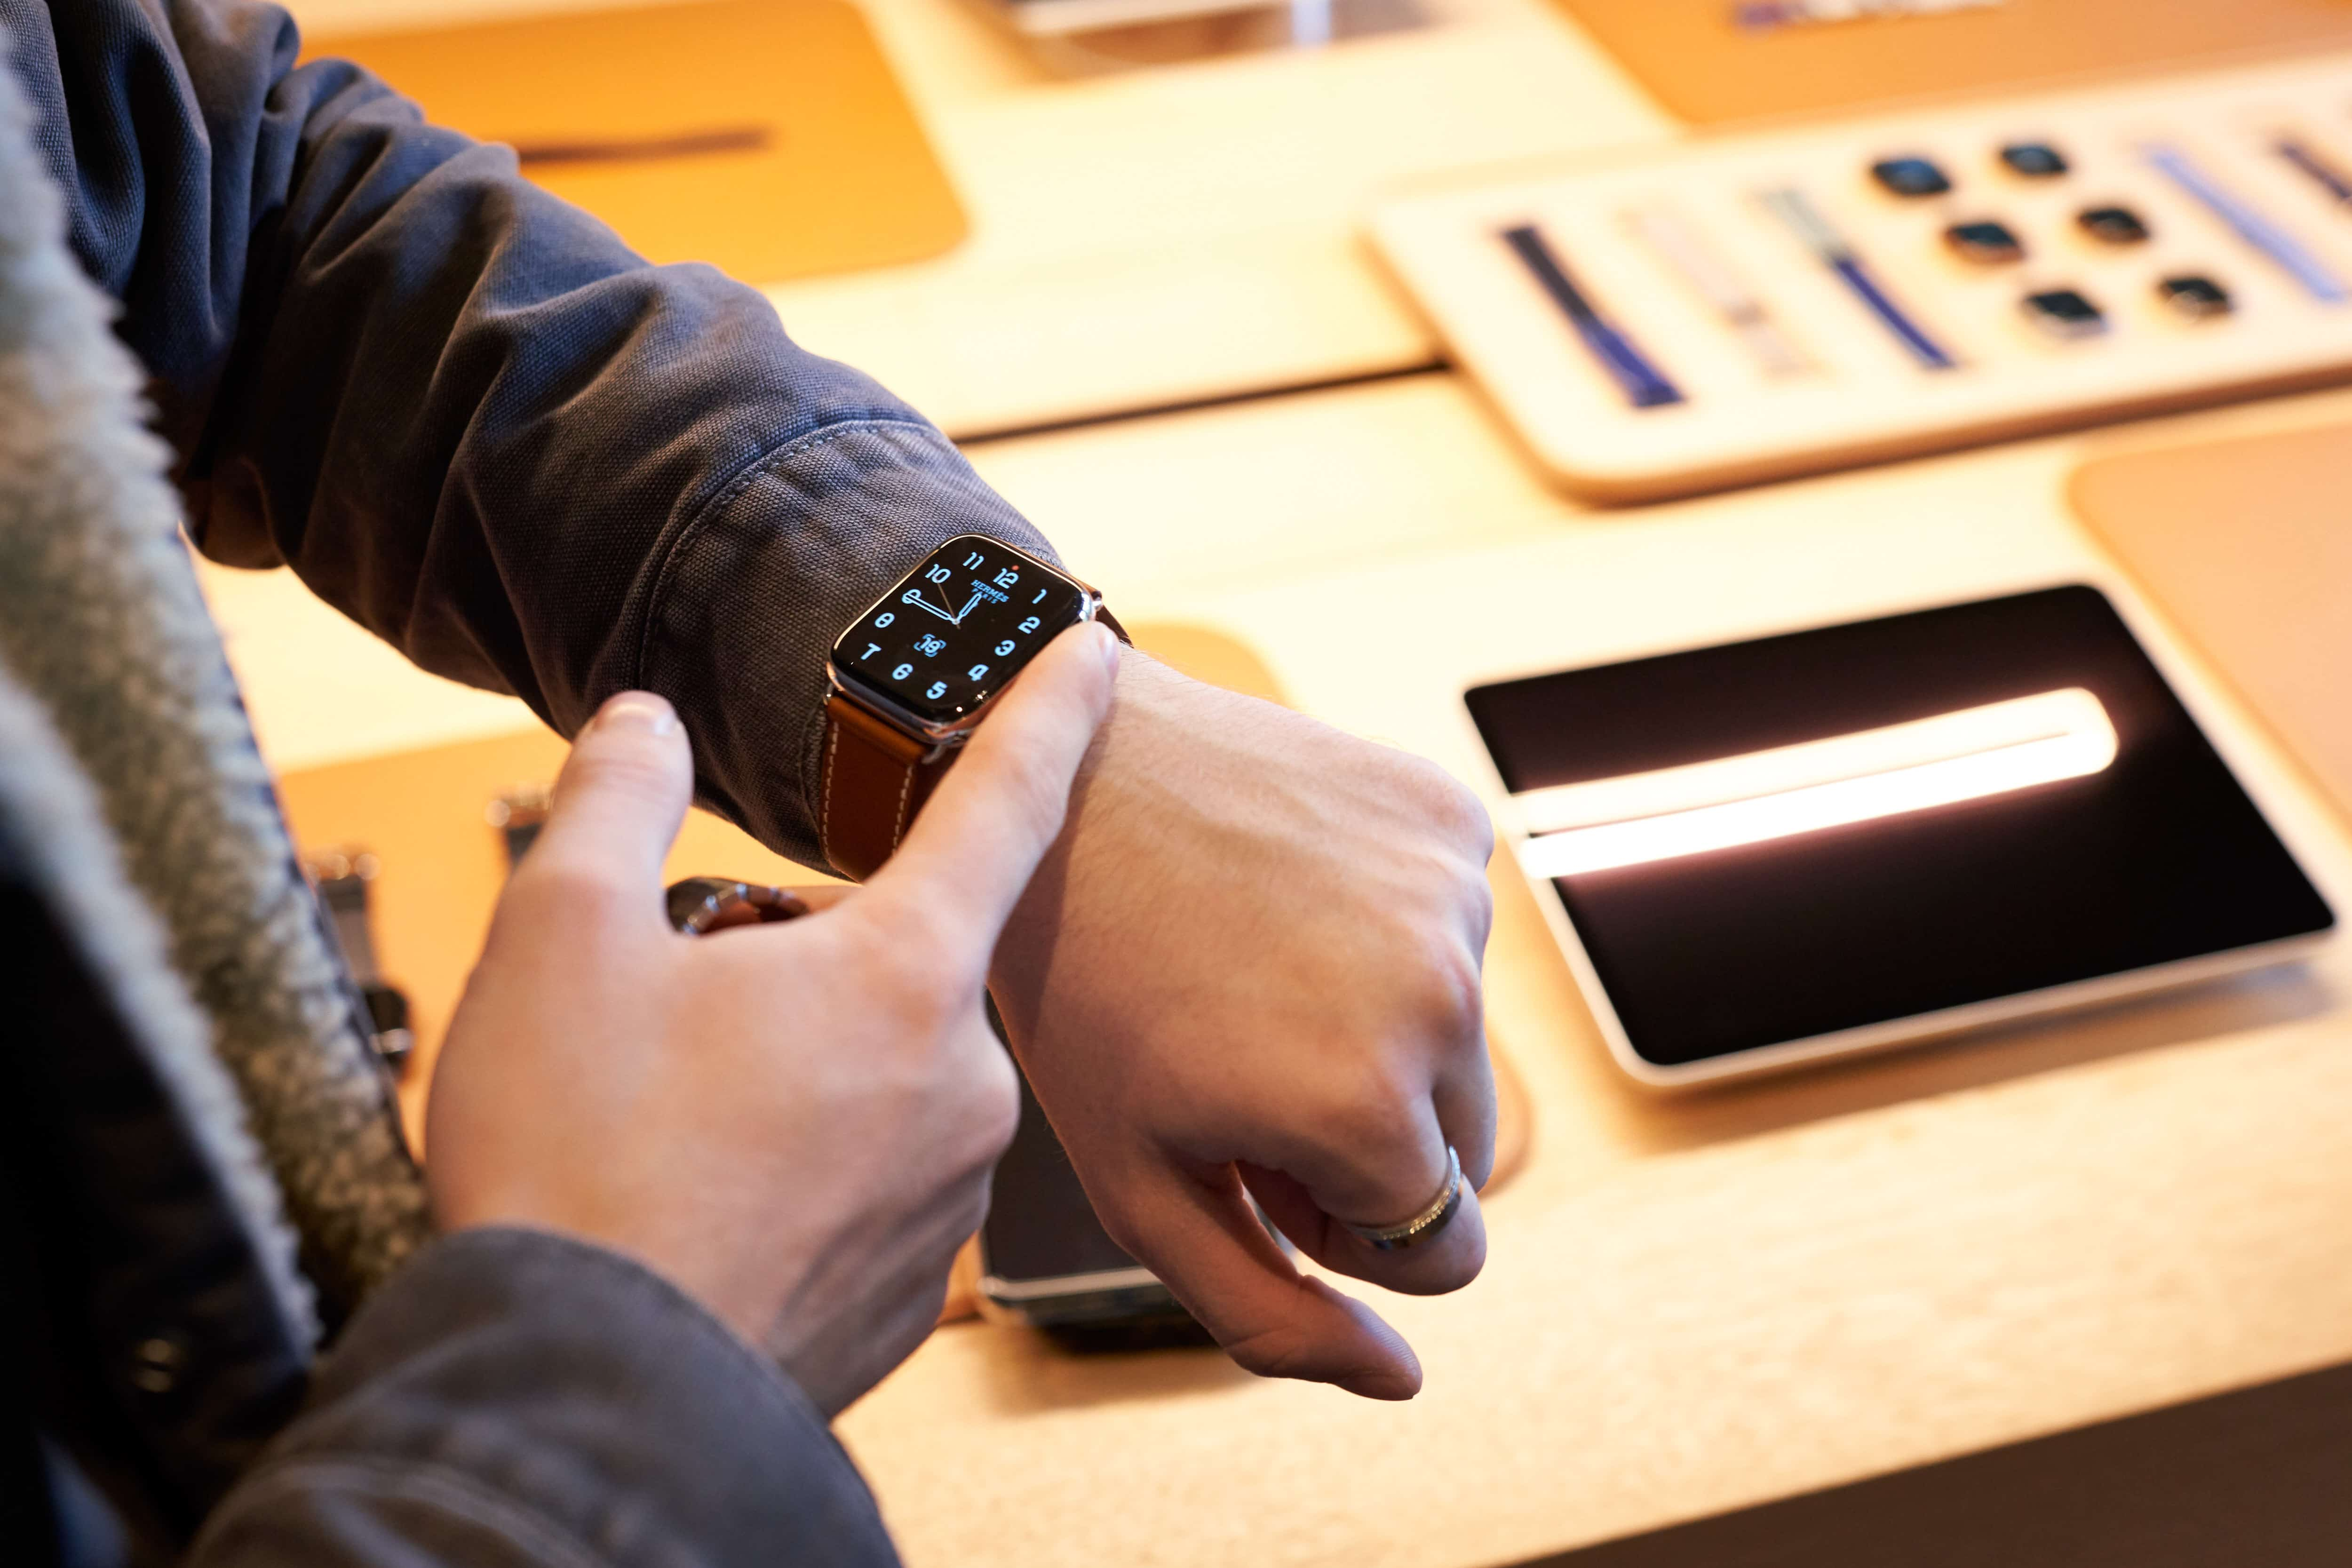 Apple Iphone 11 Pro Apple Watch 5 Availability Paris Customer Apple Watch 5 092019